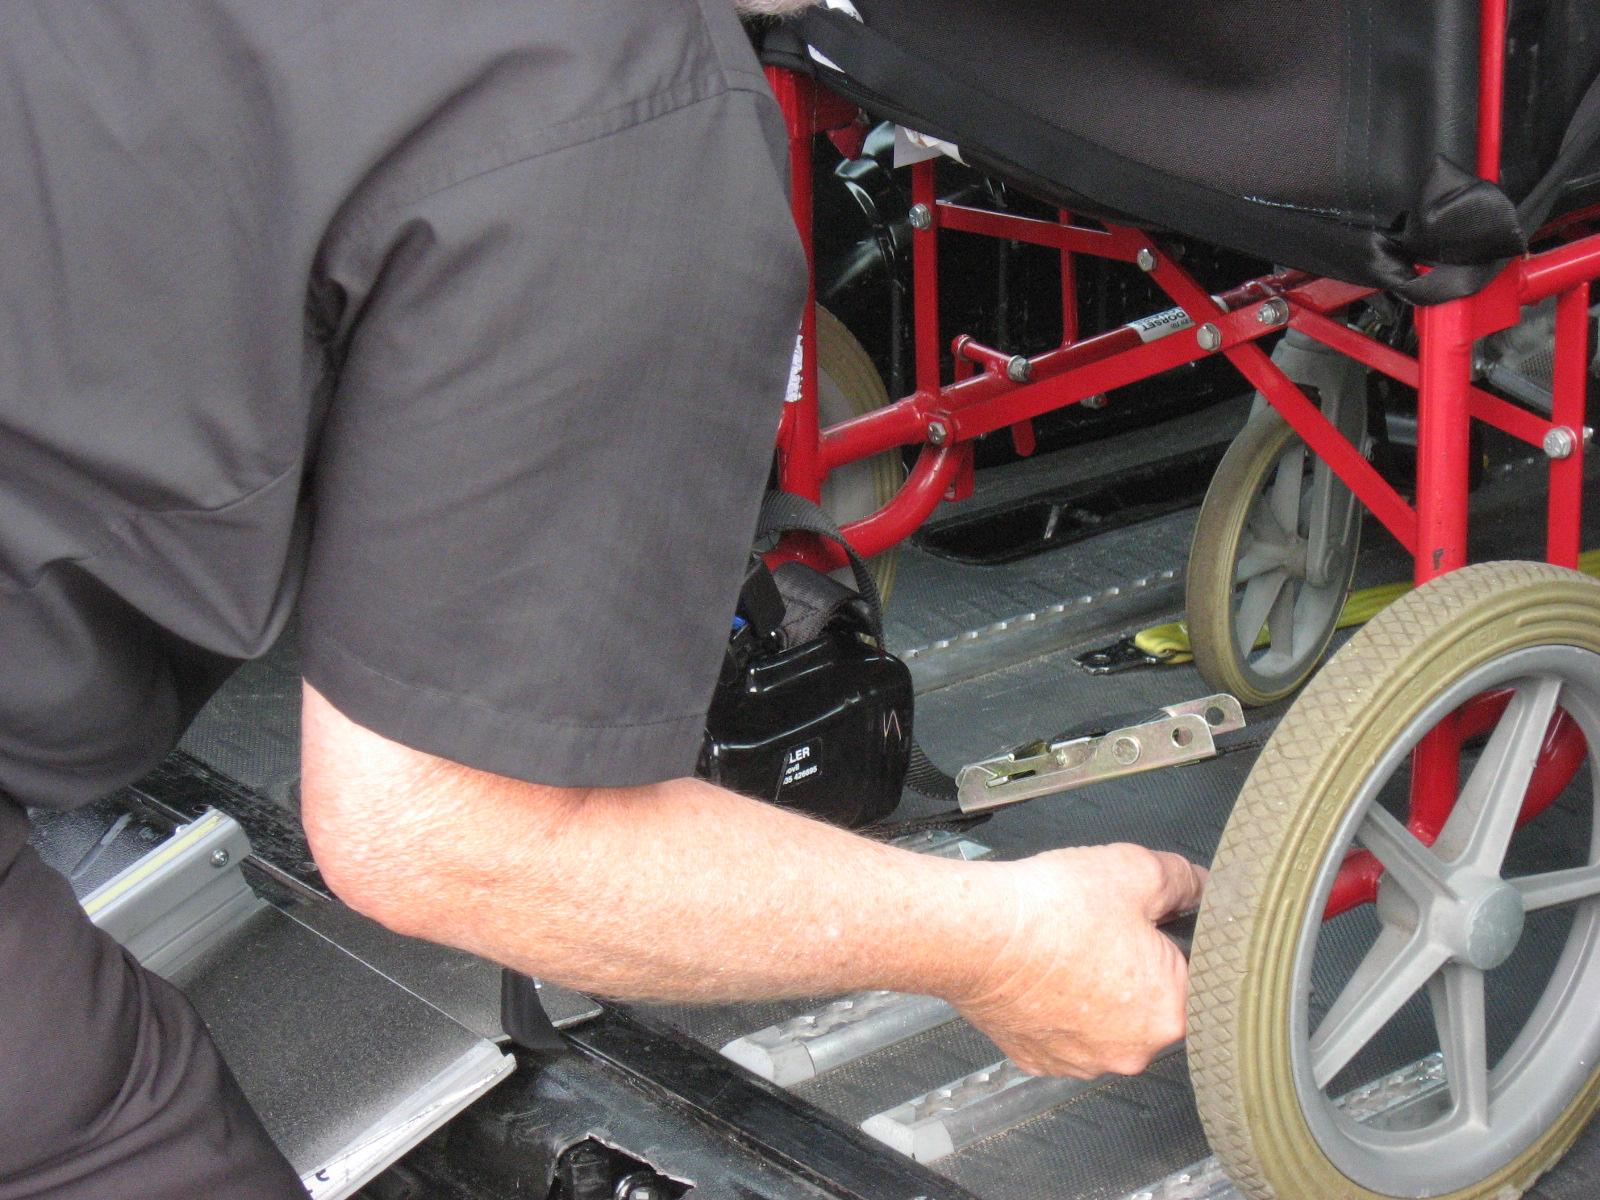 cig bins and wheelchair pics 029